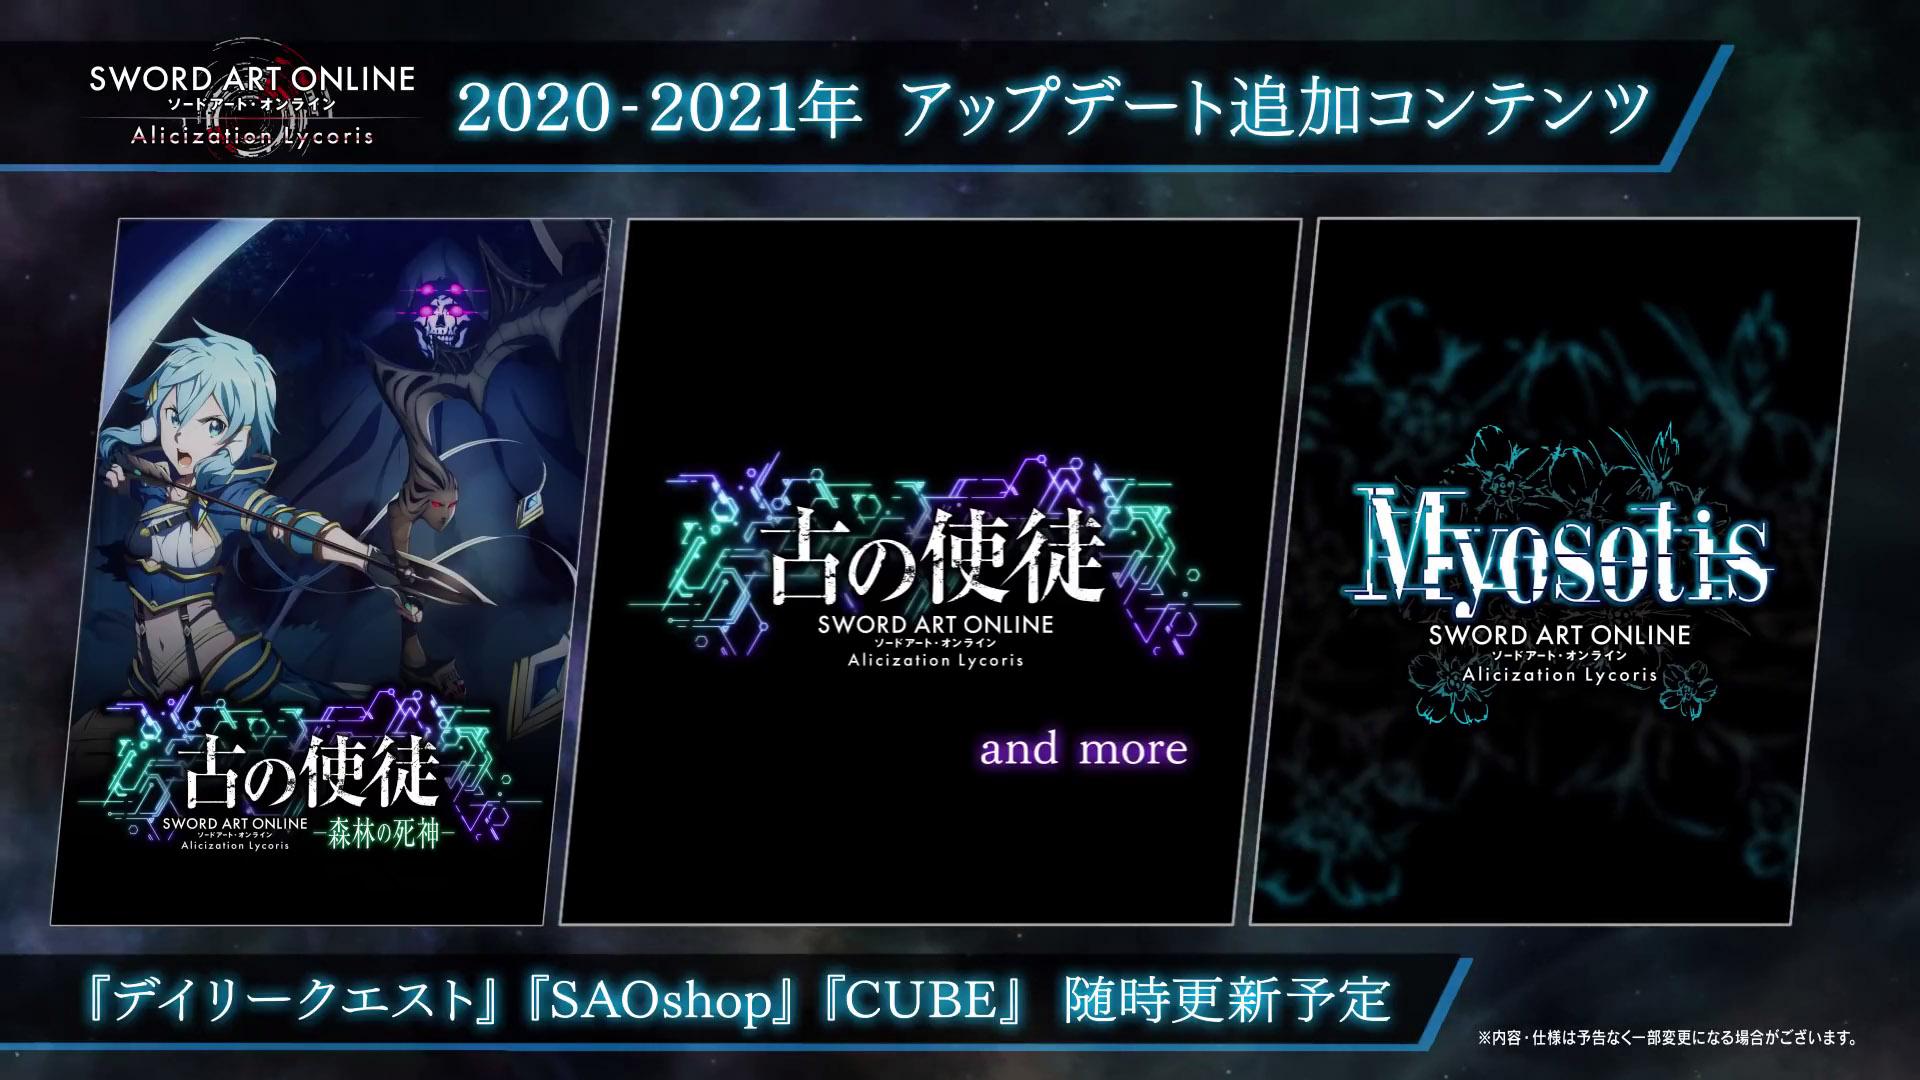 Sword Art Online: Alicization Lycoris Roadmap